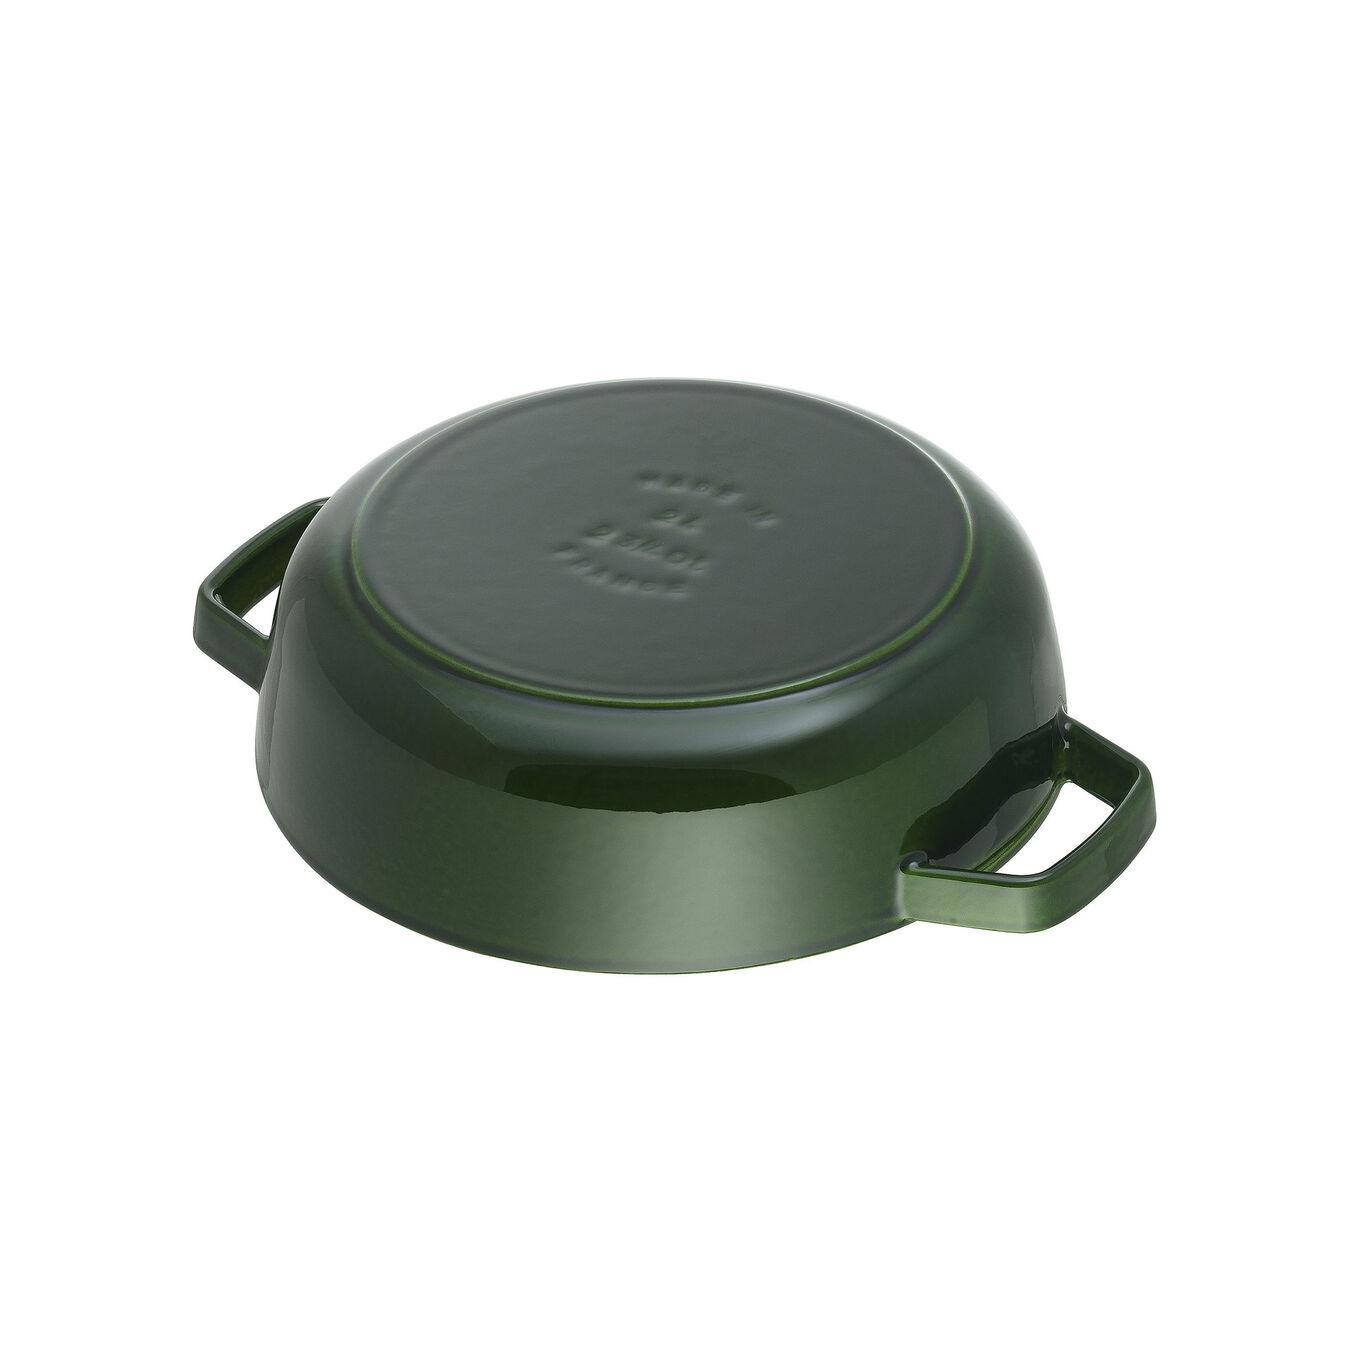 3.75 l Cast iron round Saute pan Chistera, Basil-Green,,large 4